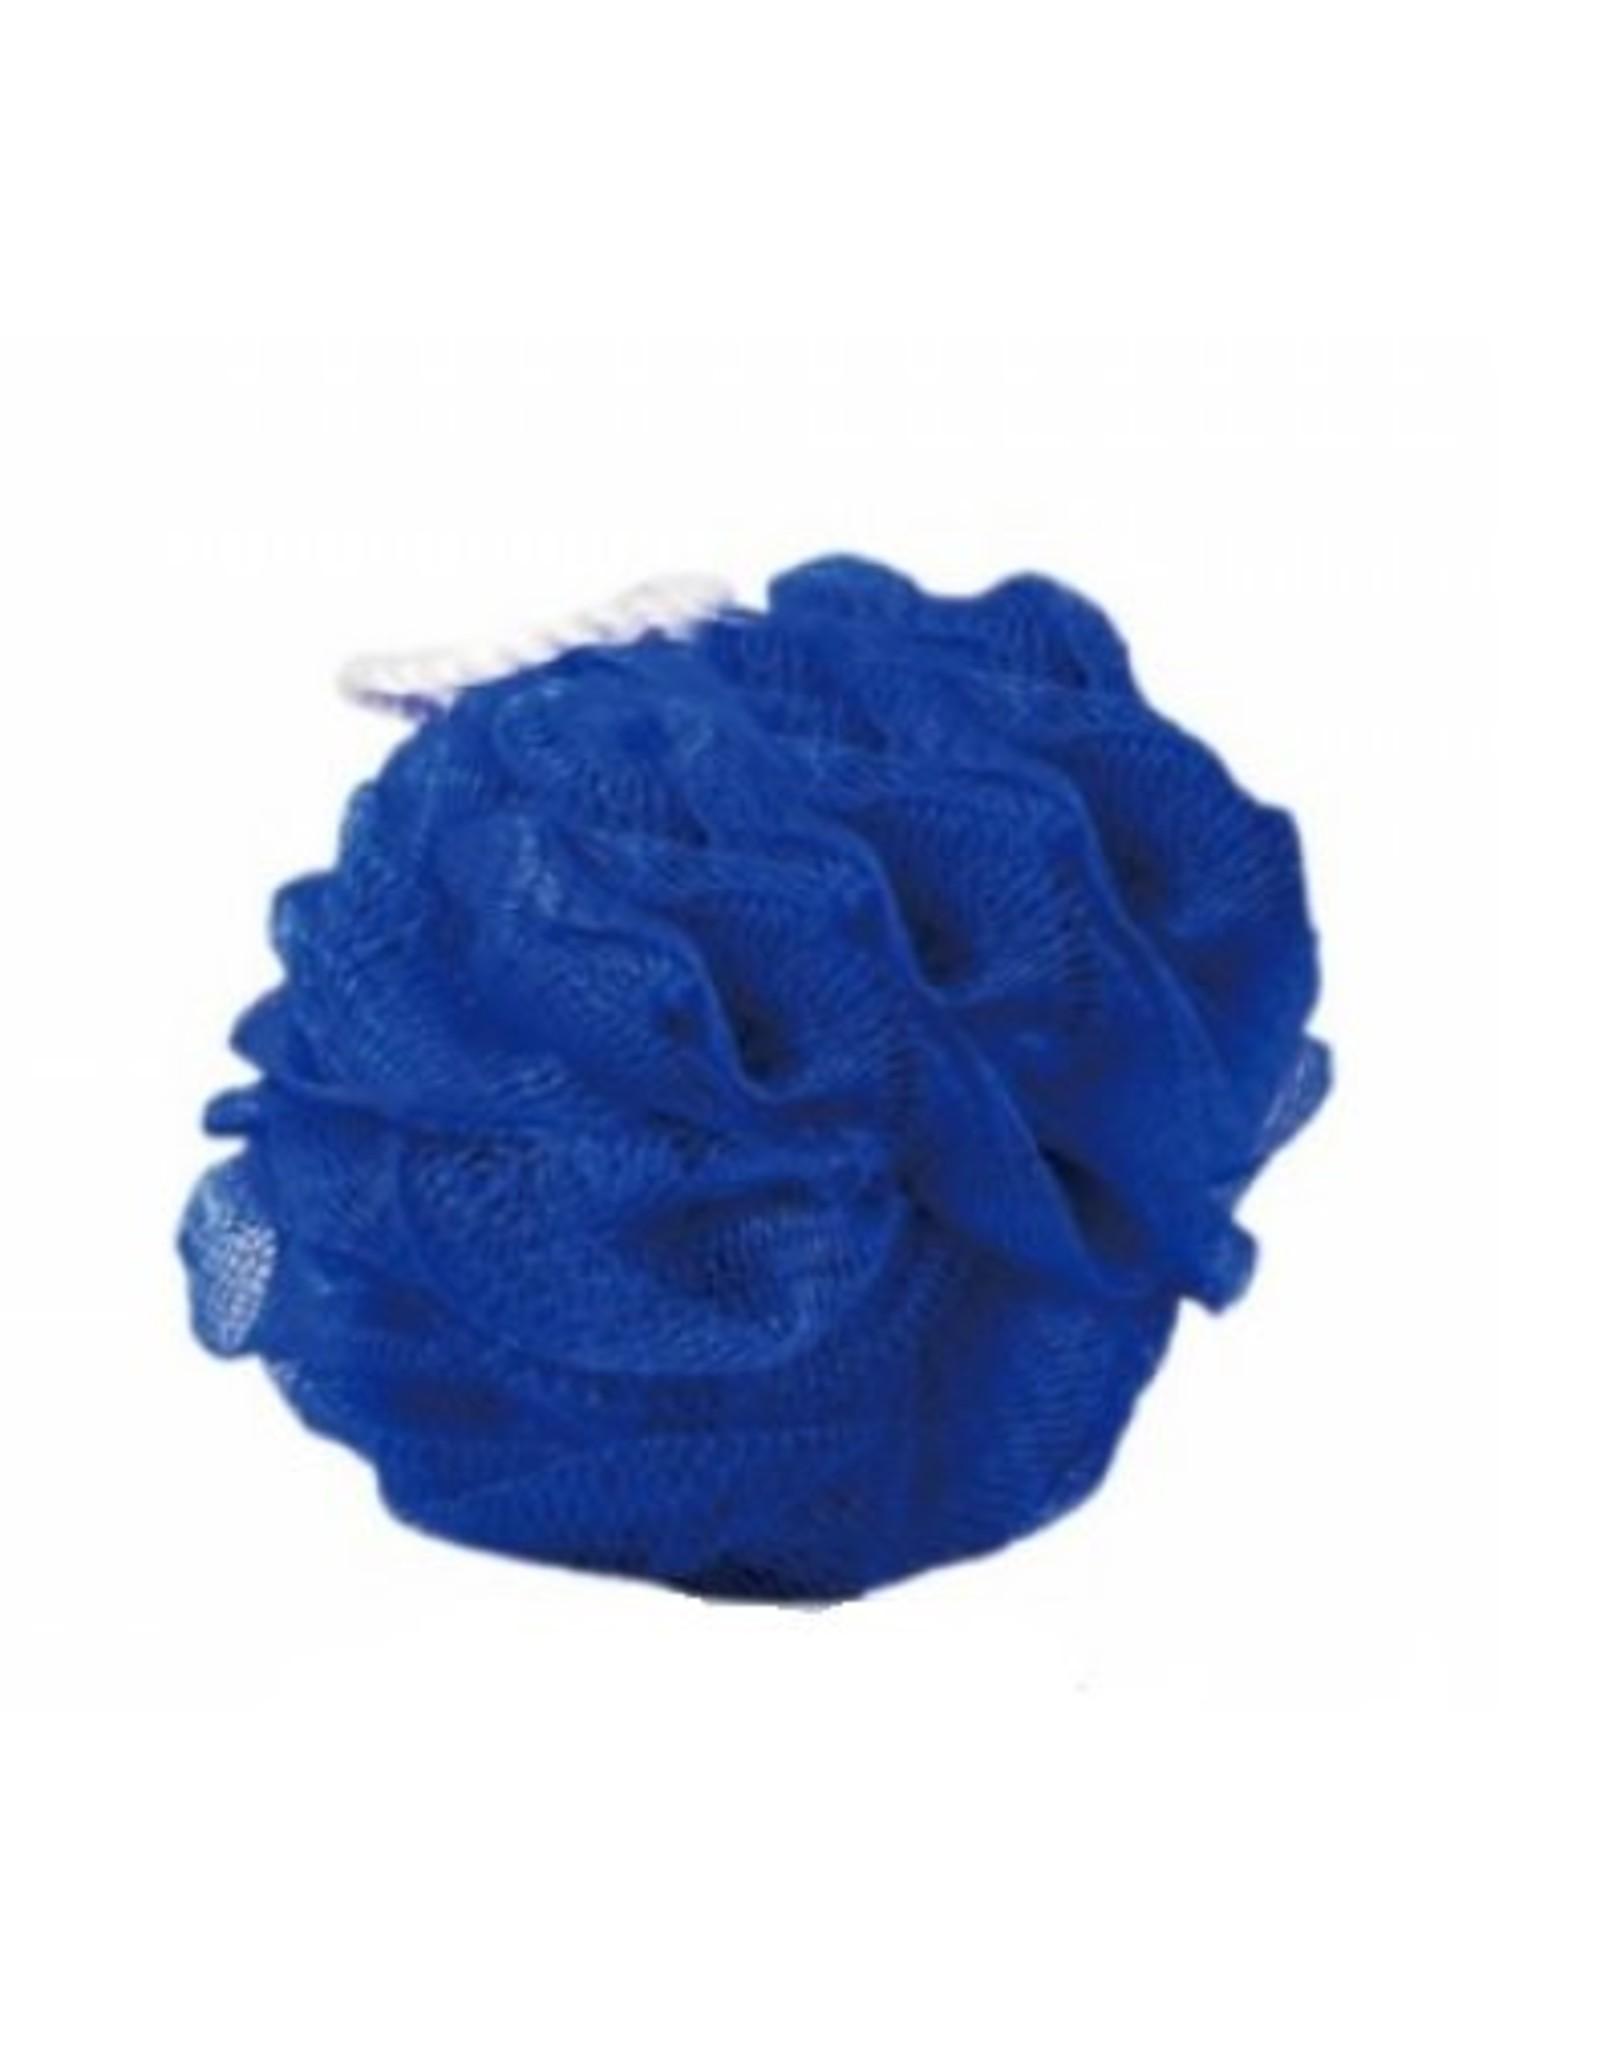 Massagespons 'blauw' - Body & Soap